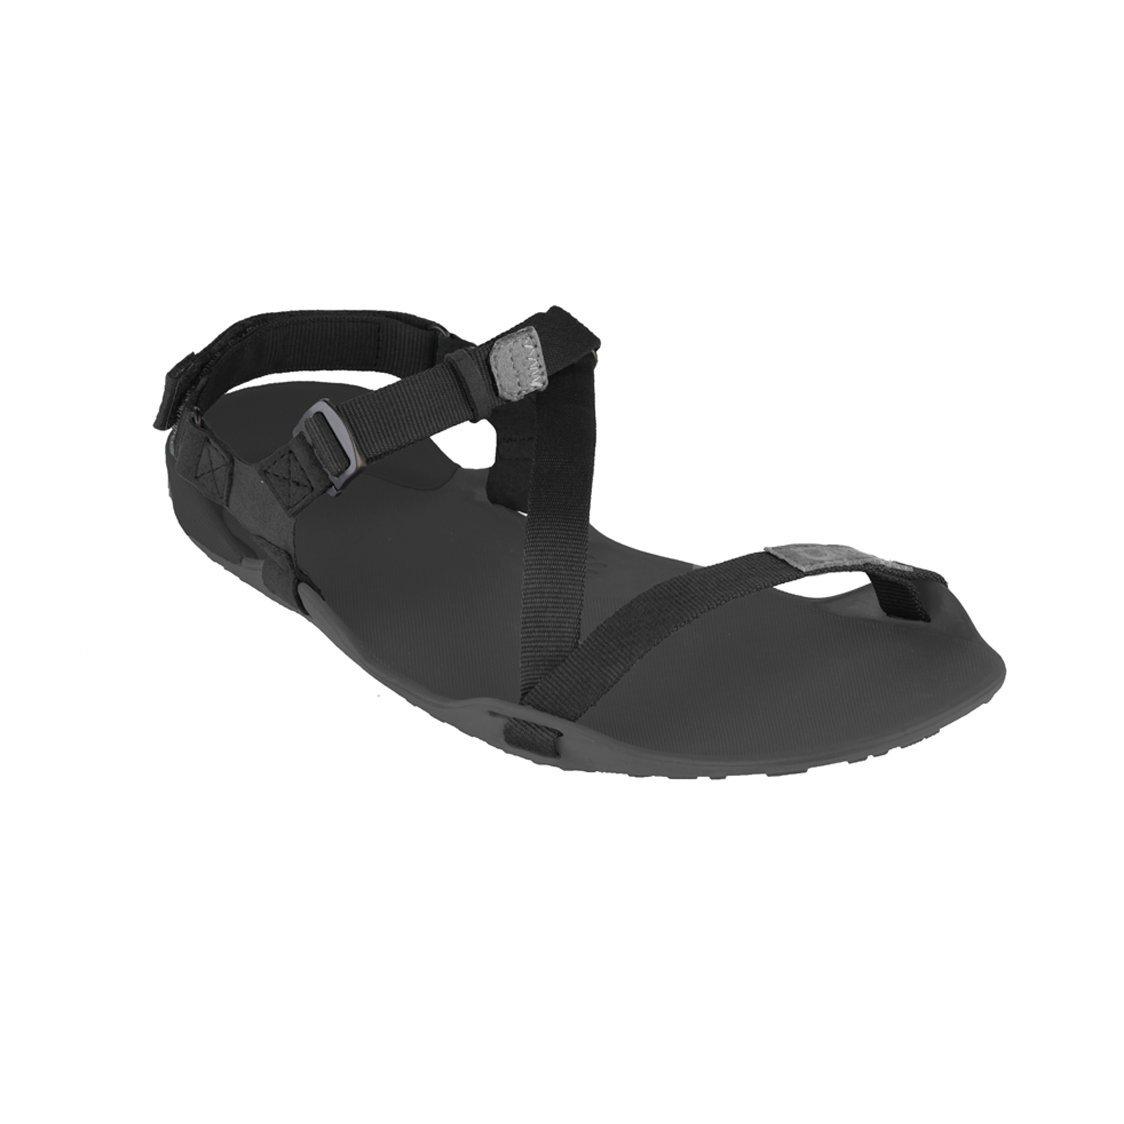 Xero Shoes Barefoot-Inspired Sport Sandals - Z-Trek - Women ZTW-CBBK-PP